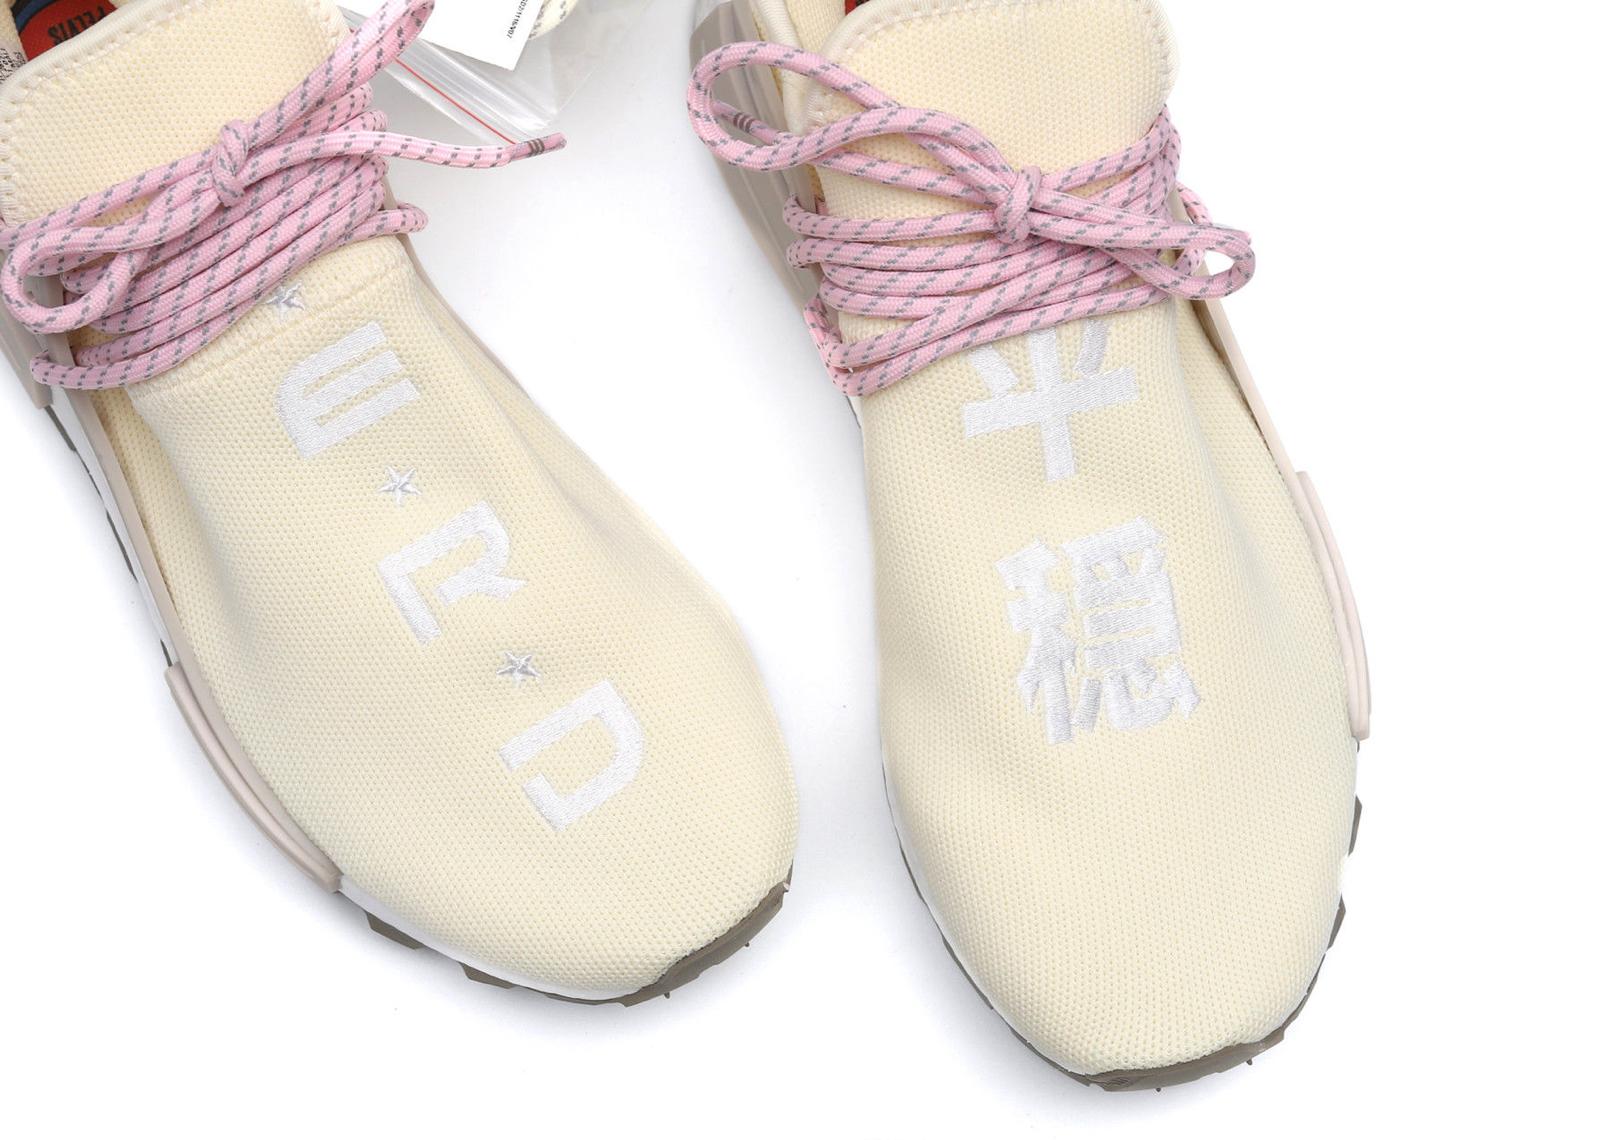 b050c9d31d4c5 adidas NMD Hu Pharrell NERD Cream - 4